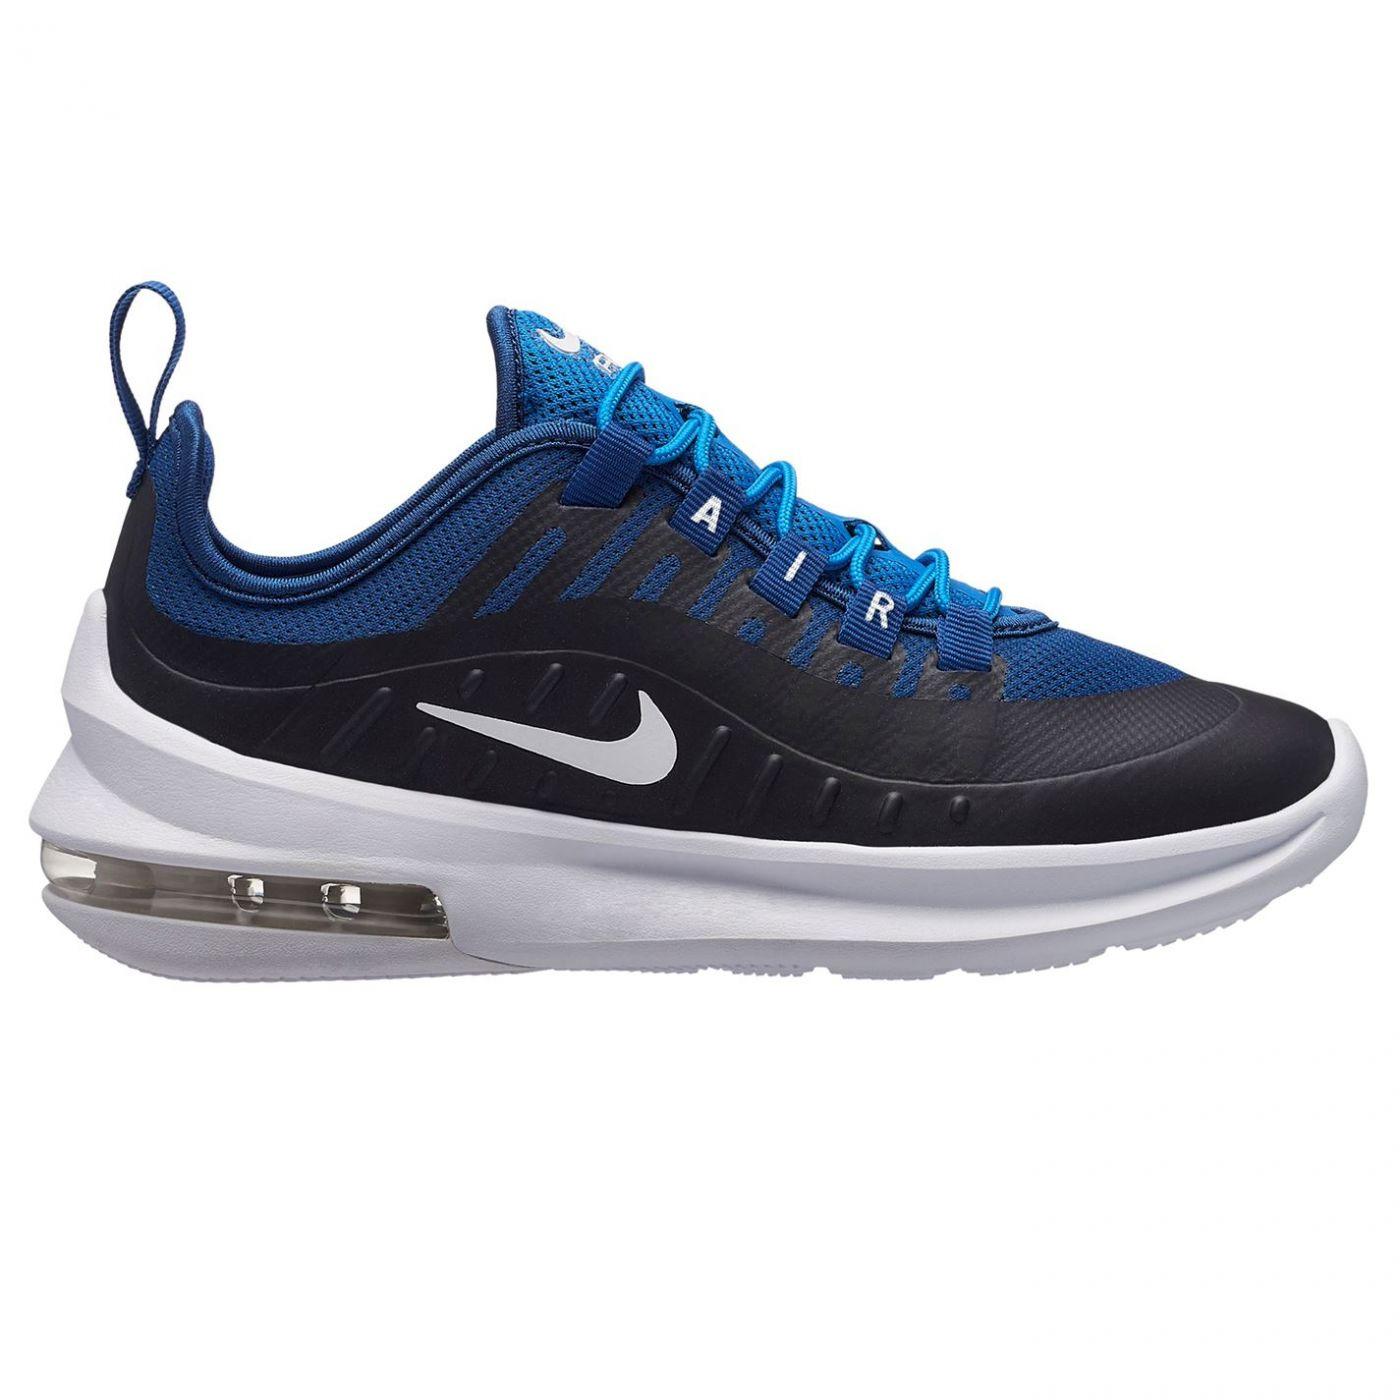 0016924219 Nike Air Max Axis Trainers dětské Boys - FACTCOOL